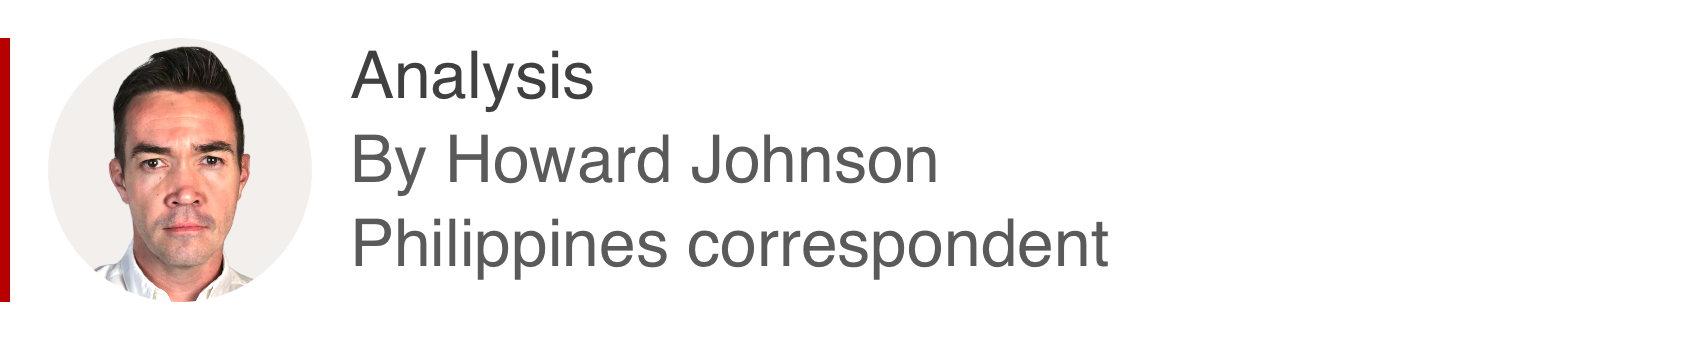 Analysis box by Howard Johnson, Philippines correspondent